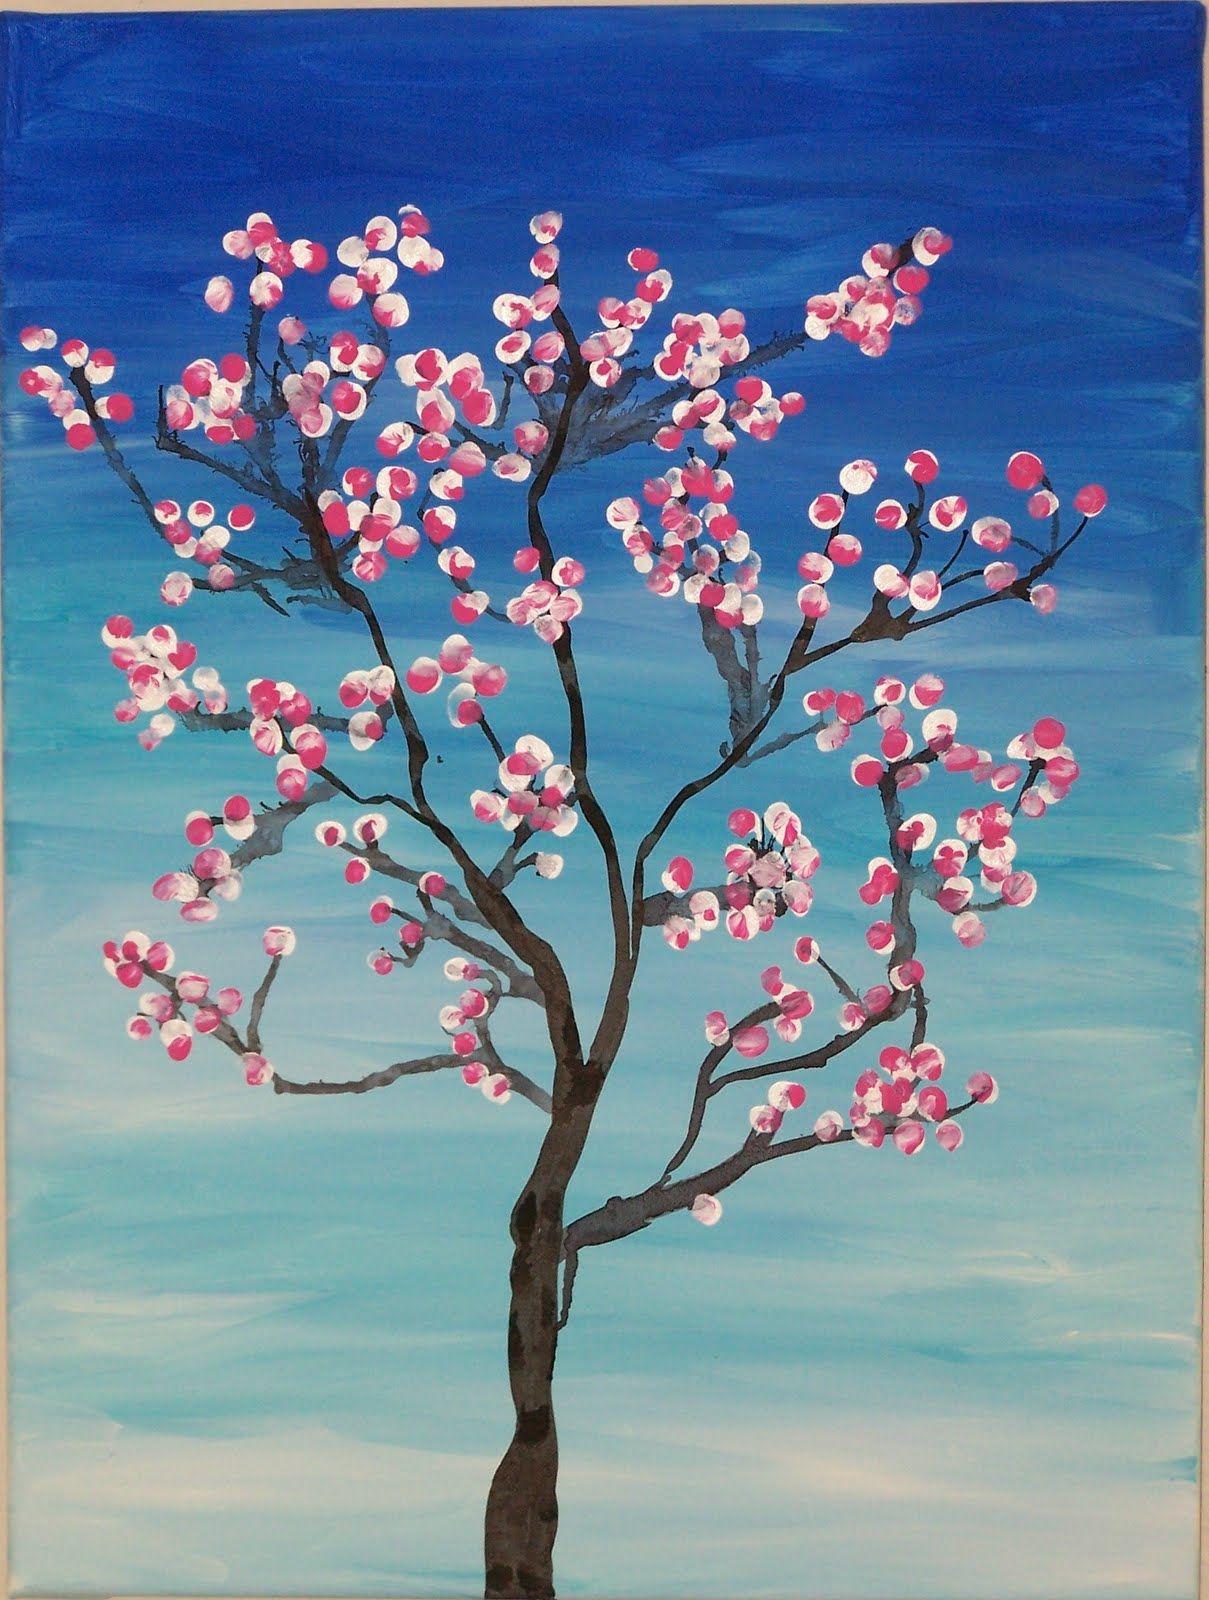 Google Image Result For Http 1 Bp Blogspot Com Nxkxwkwndew S7 7ctbiuyi Aaaaaaaaaco 1iczk3m3tjc S1600 Scottclassp Spring Art Projects Spring Art Blossoms Art